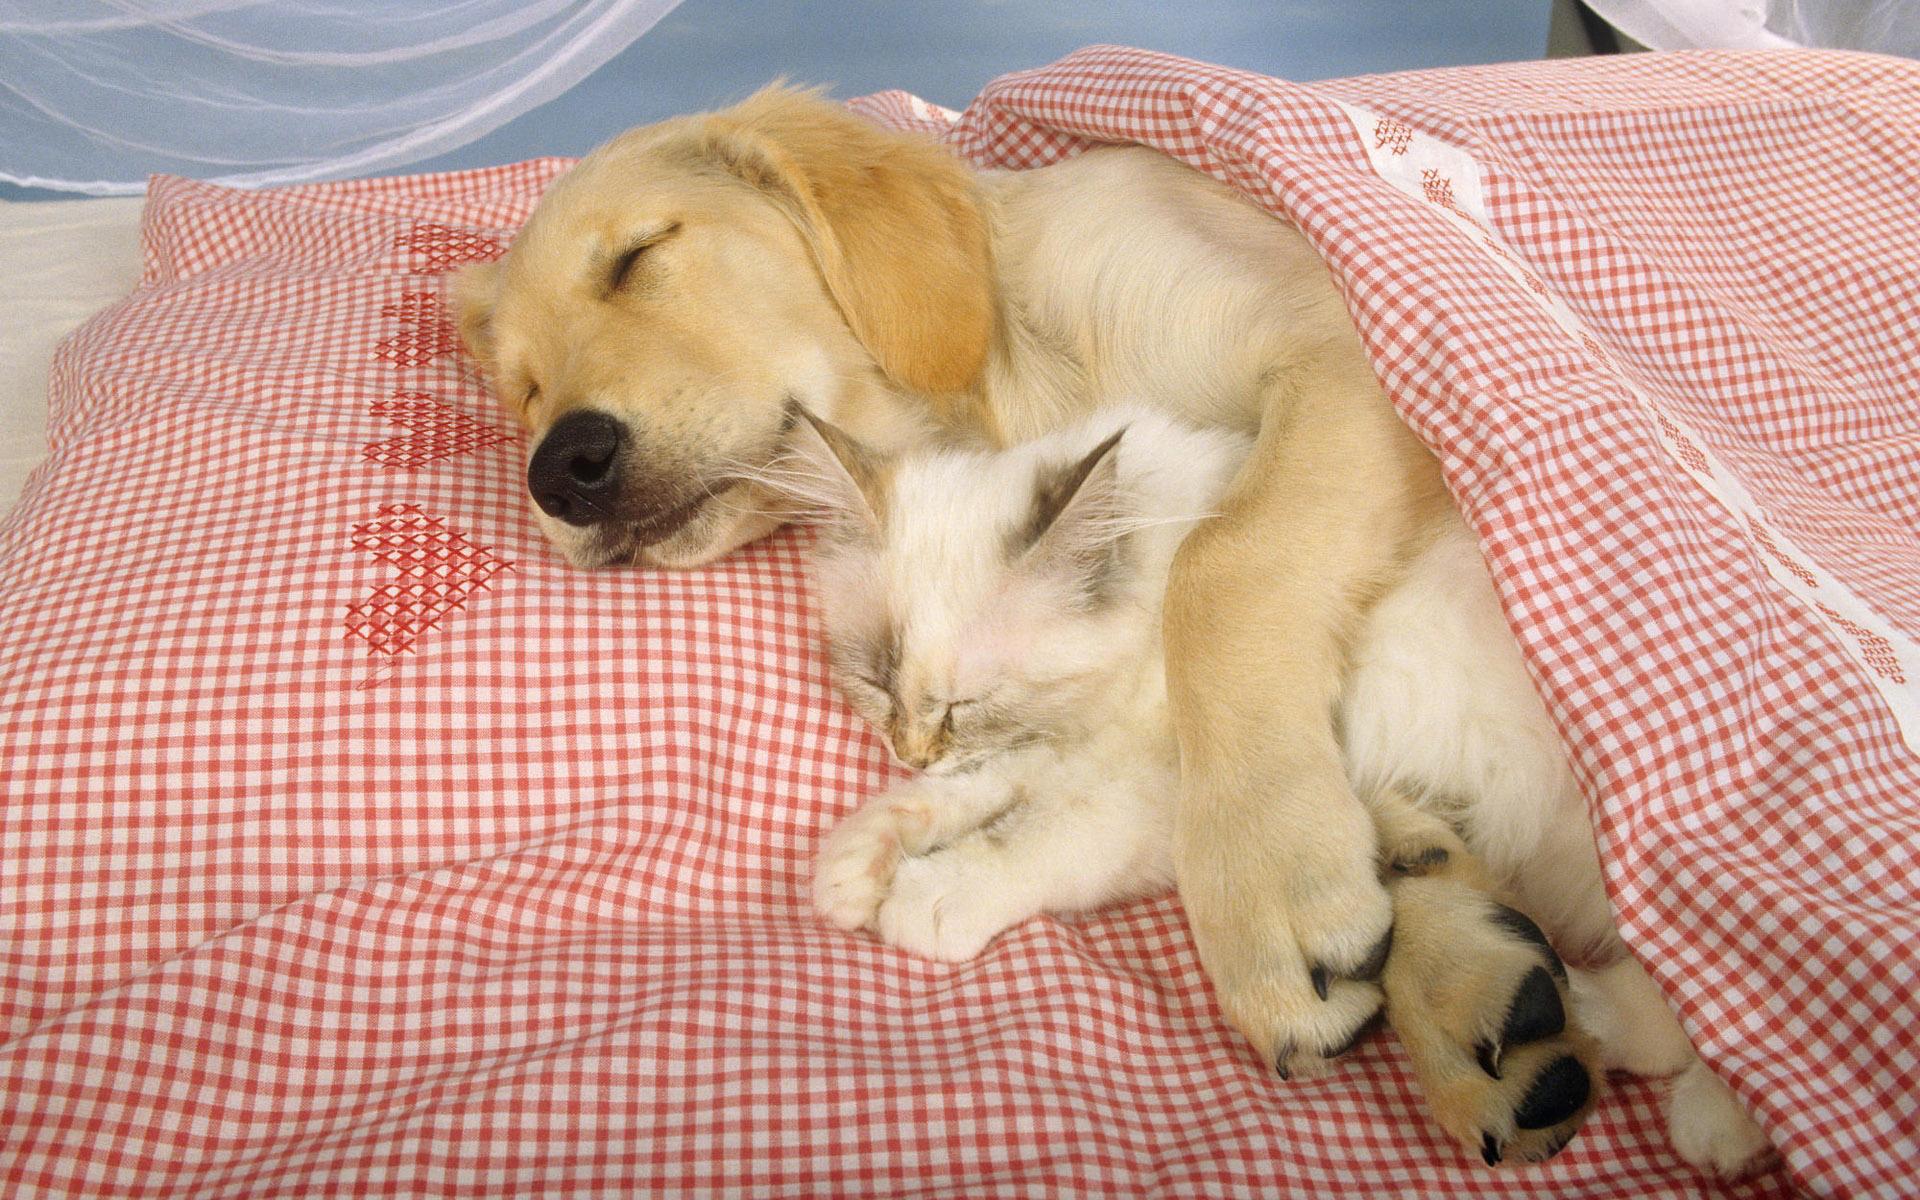 wallpaper cats and dogs   HD Desktop Wallpapers 4k HD 1920x1200